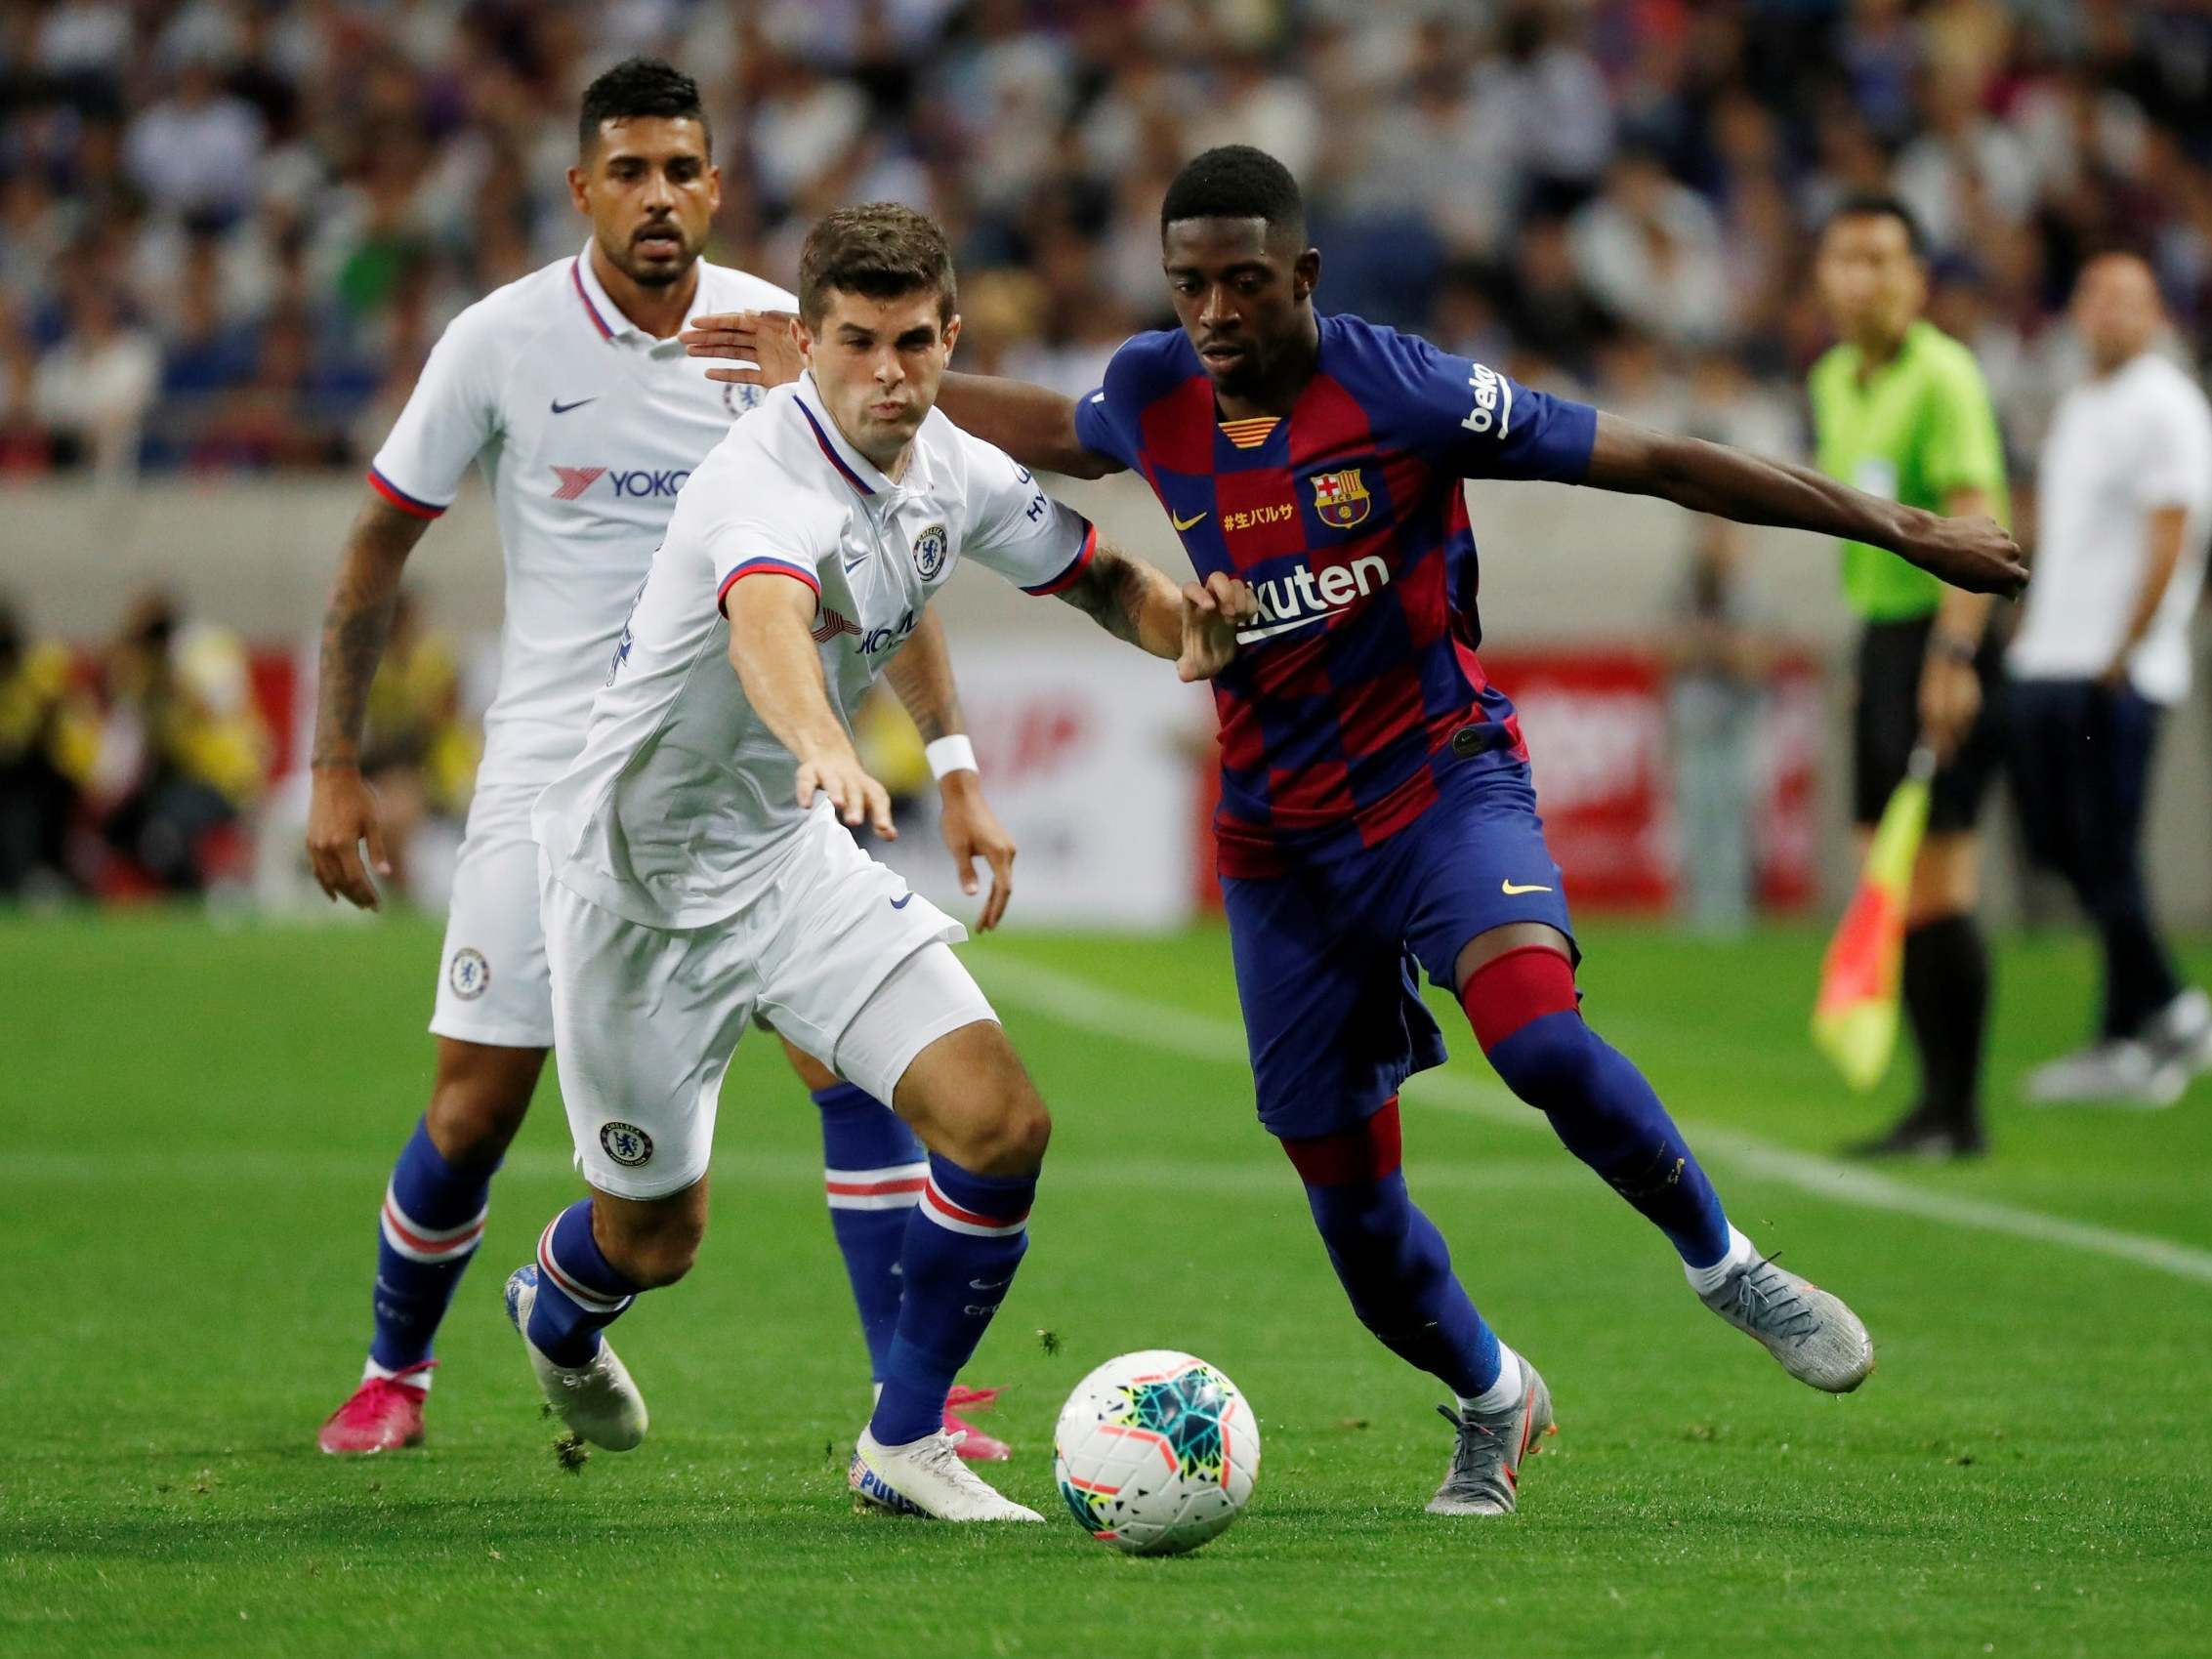 Barcelona Vs Chelsea Live Stream: How To Watch Pre-season